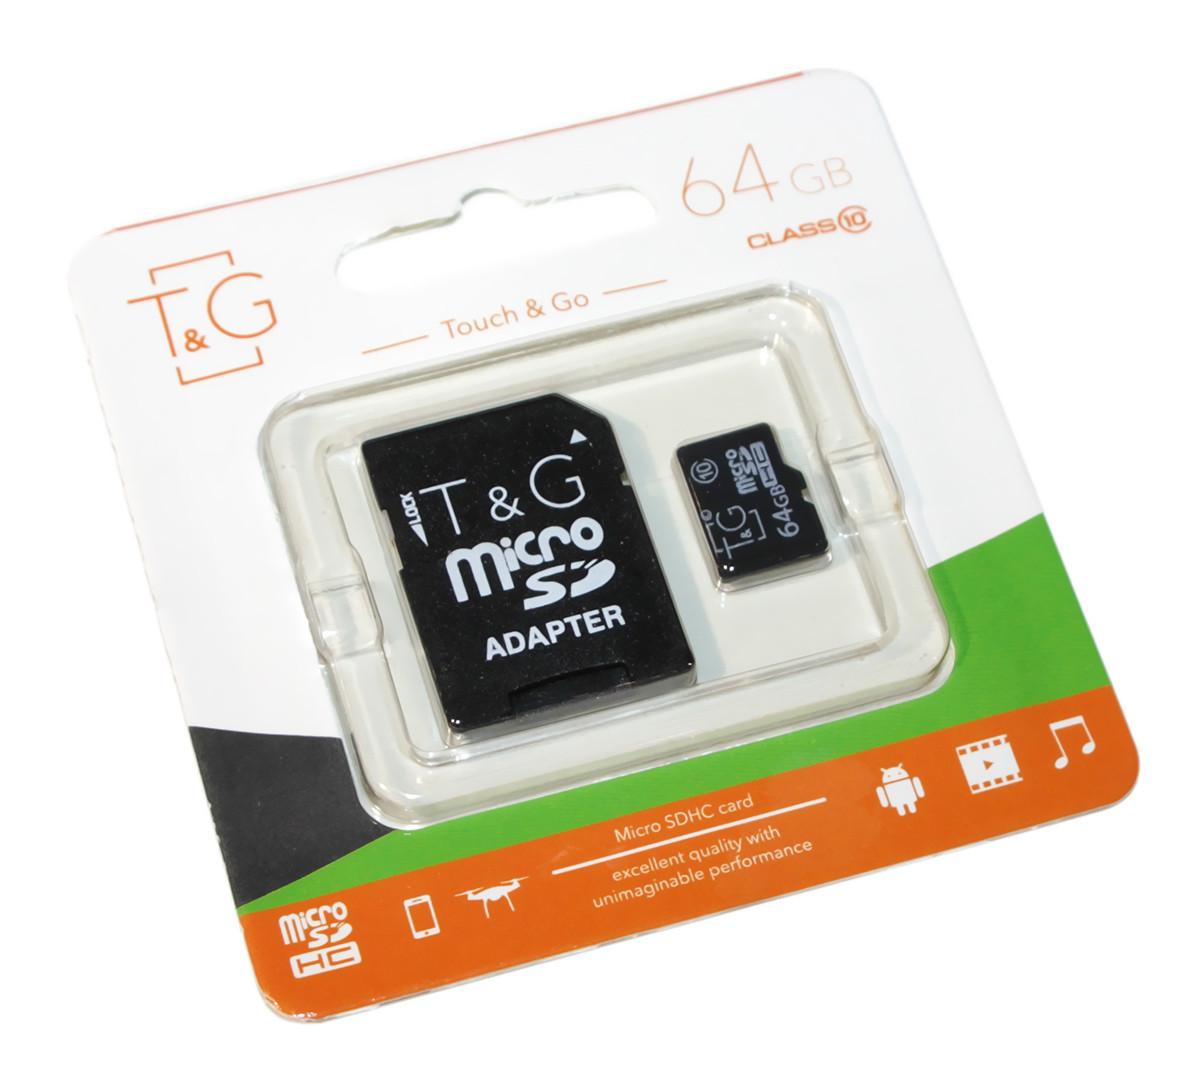 Карта памяти microSDHC, 64Gb, Class10 UHS-I, T&G, SD адаптер (TG-64GBSDCL10-01)